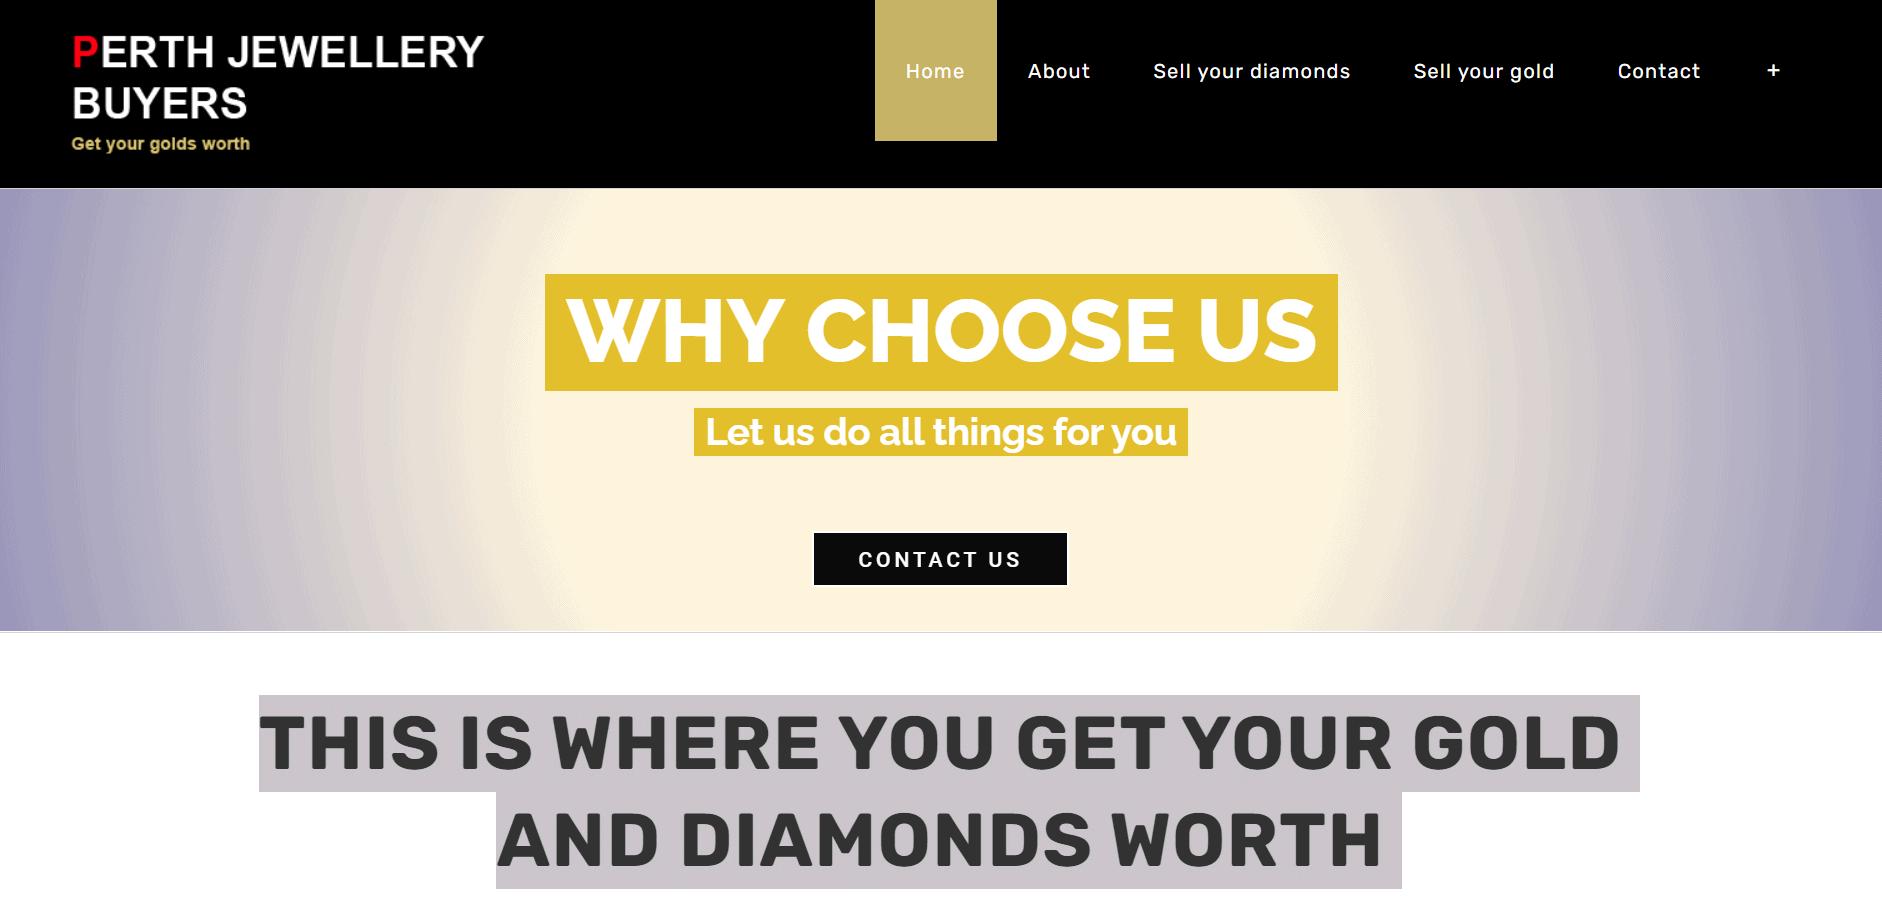 Perth Jewellery Buyers